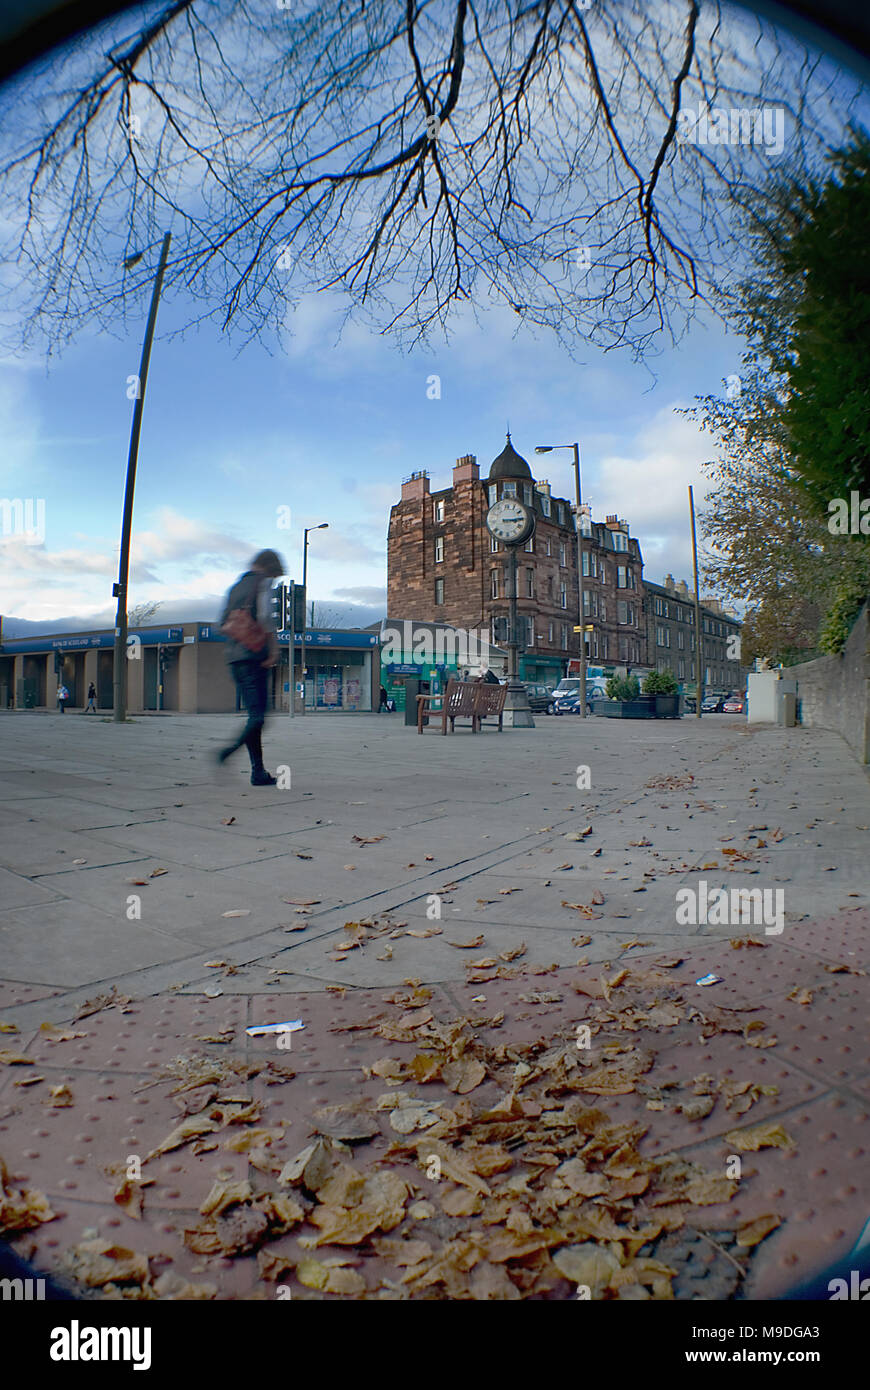 EDINBURGH, SCOTLAND - NOVEMBER 4TH 2009: A woman strolling towards the Morningside clock in Edinburgh. - Stock Image